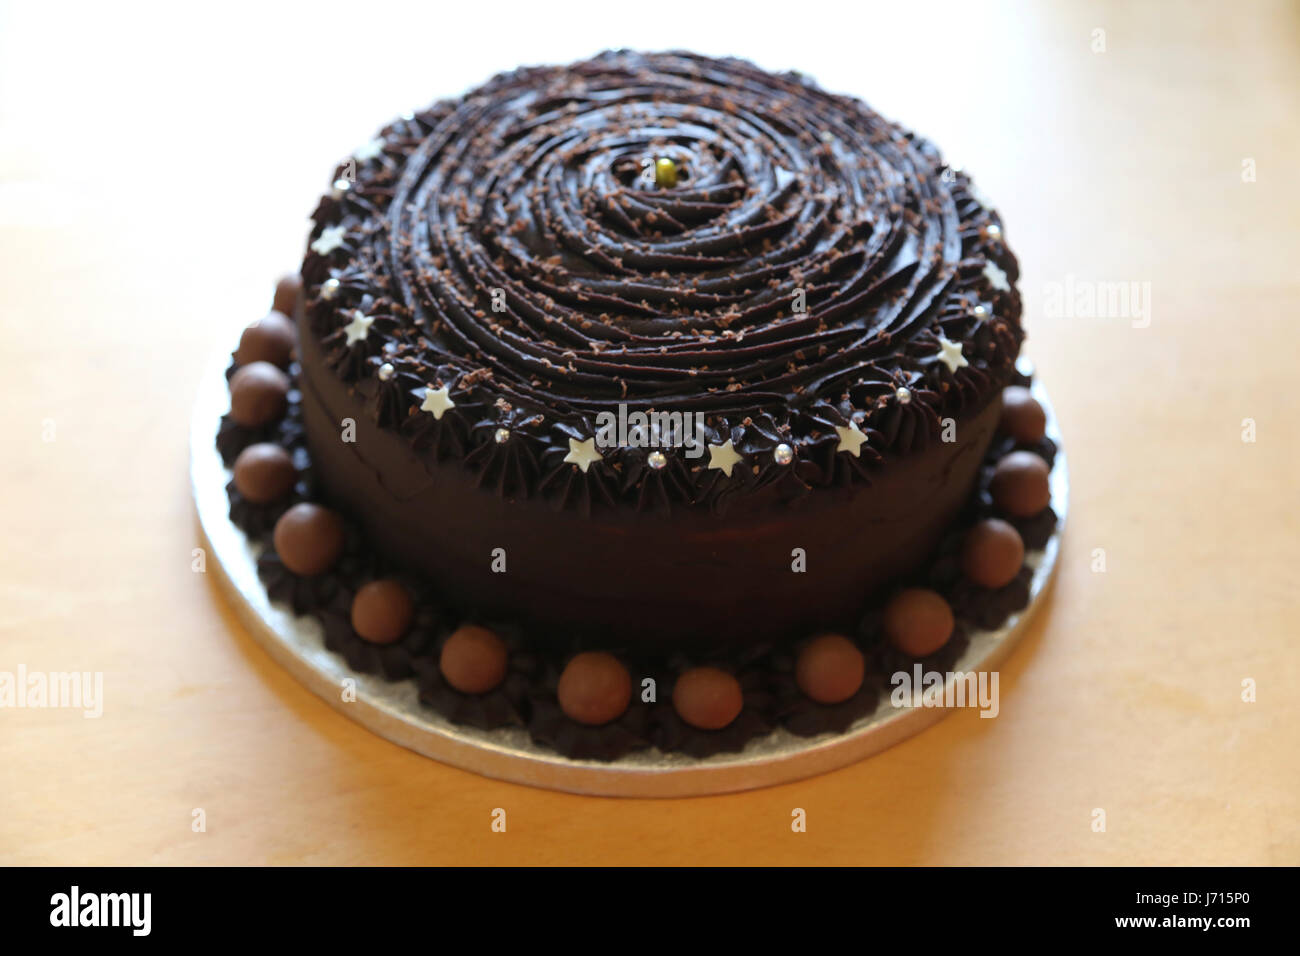 Gateau Au Chocolat Fait Maison Avec Maltesers Photo Stock Alamy